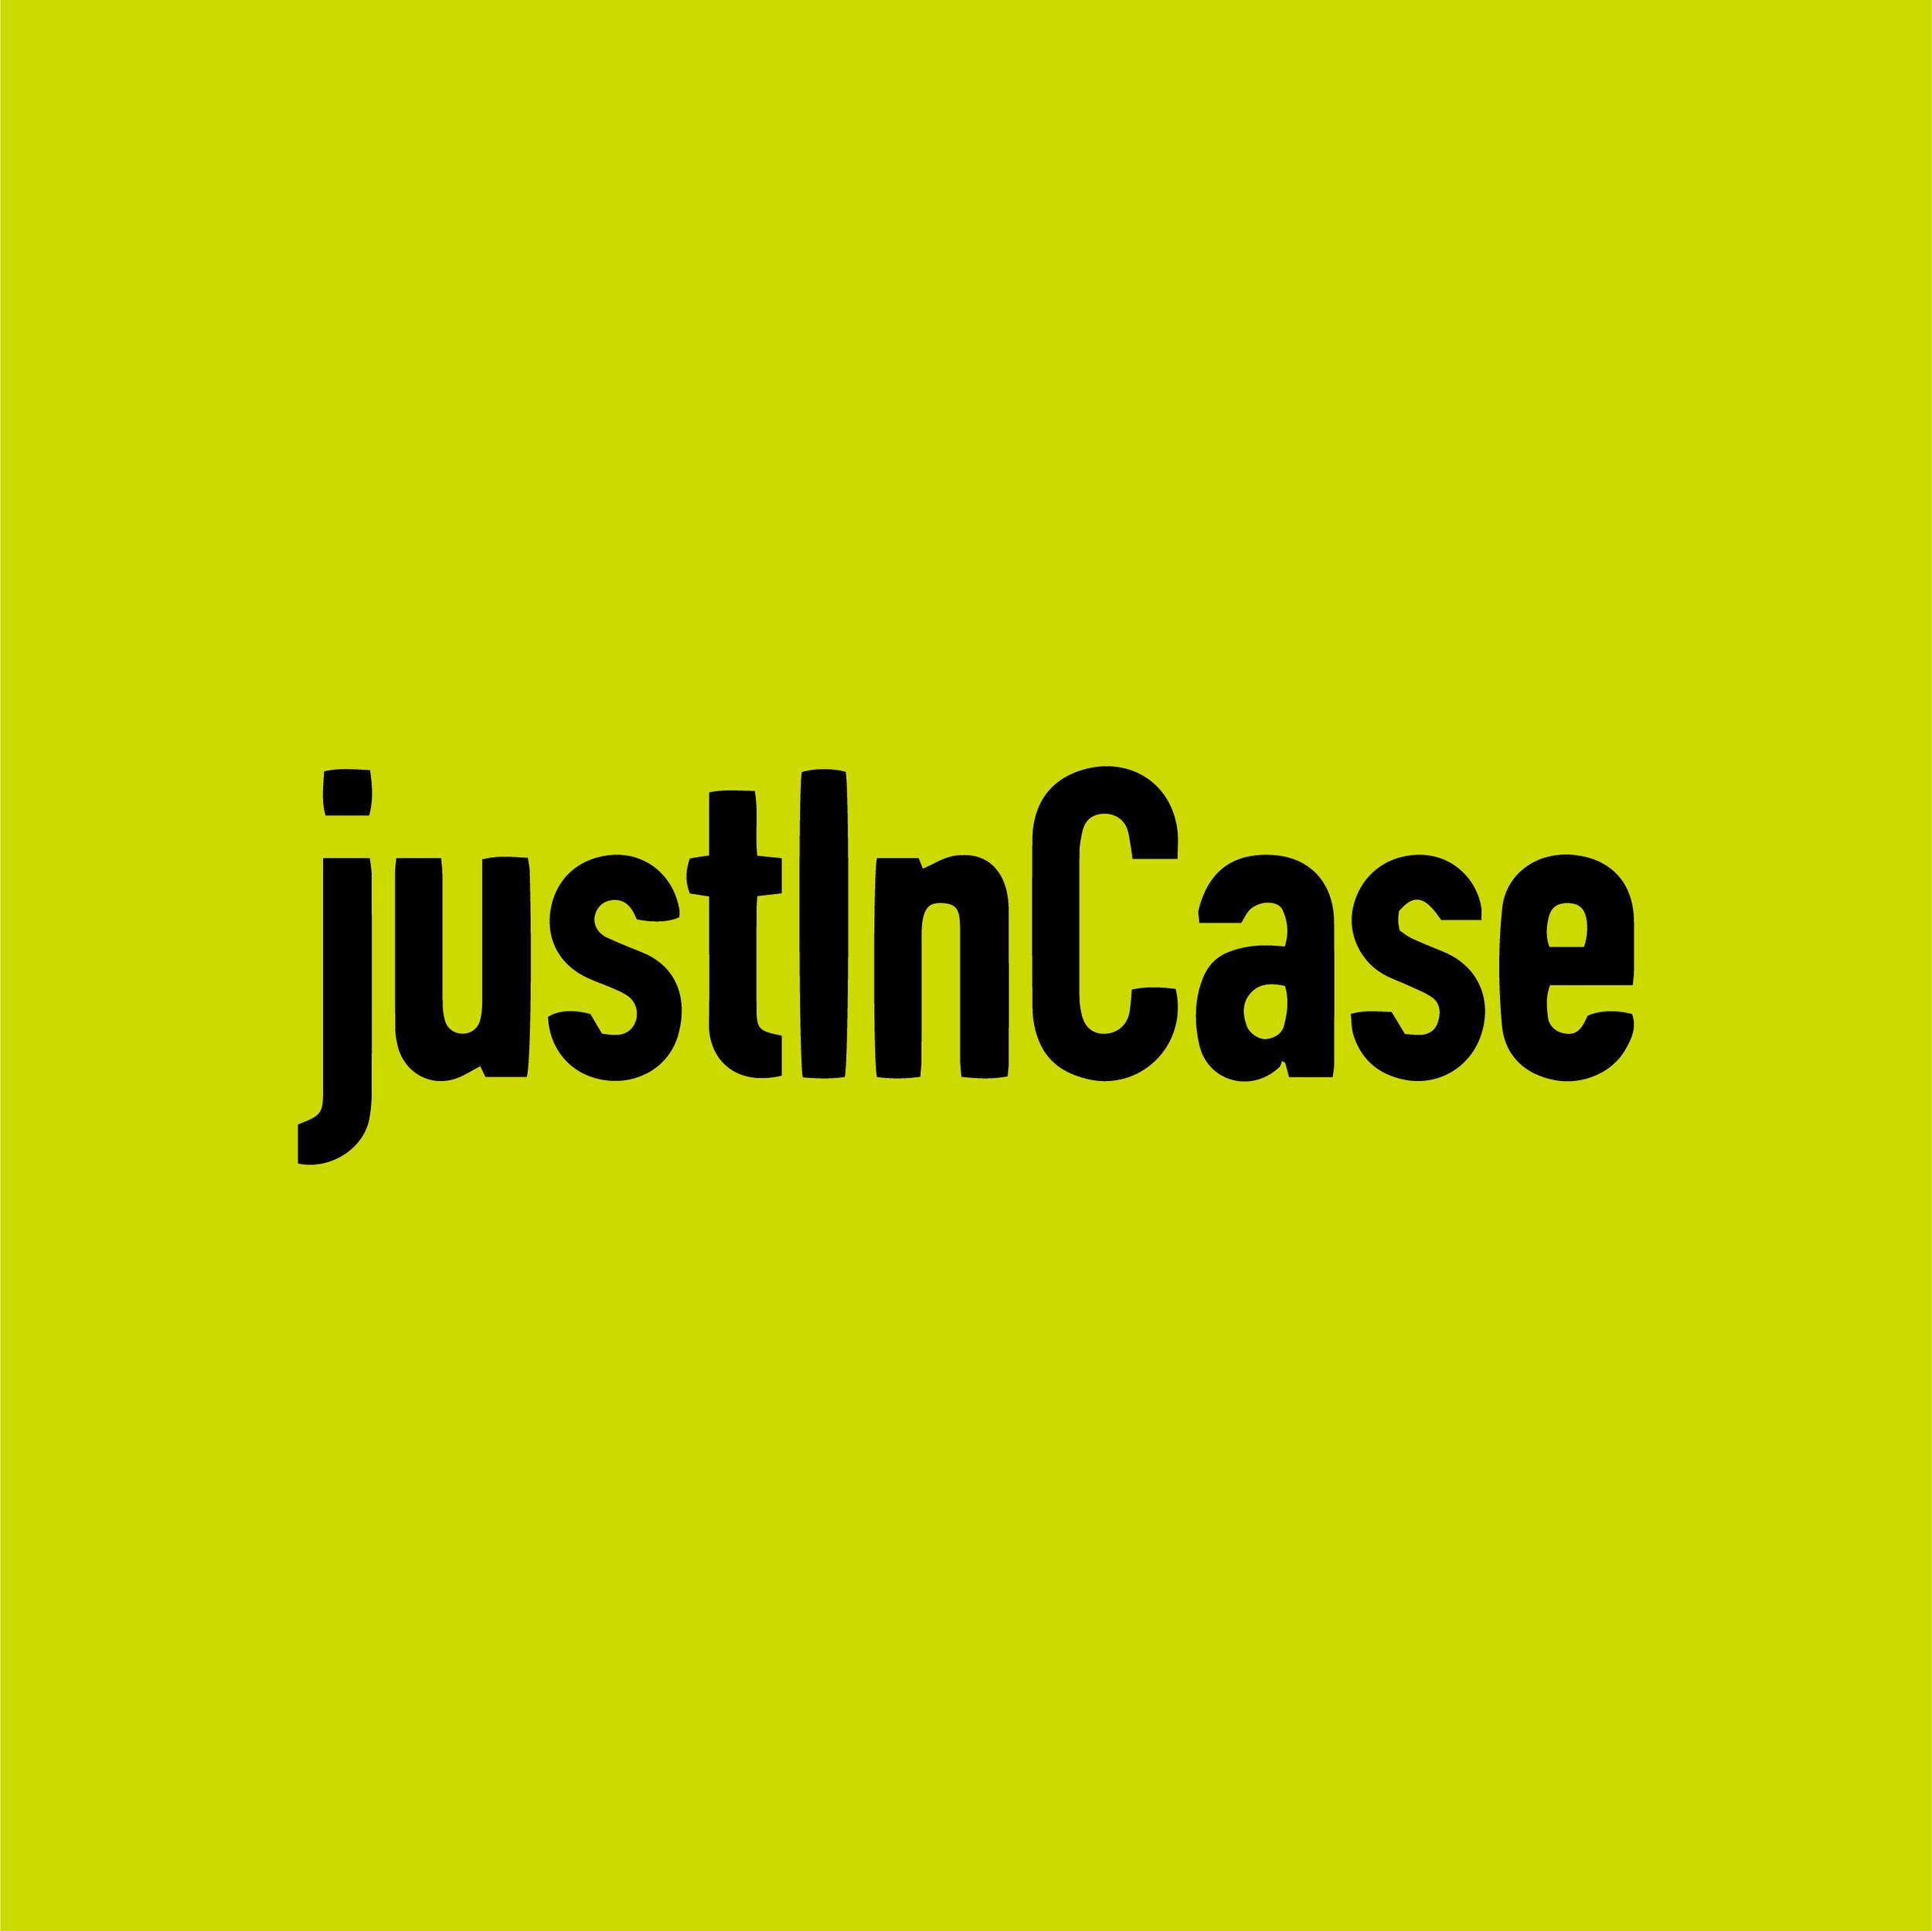 justincase-sq.png